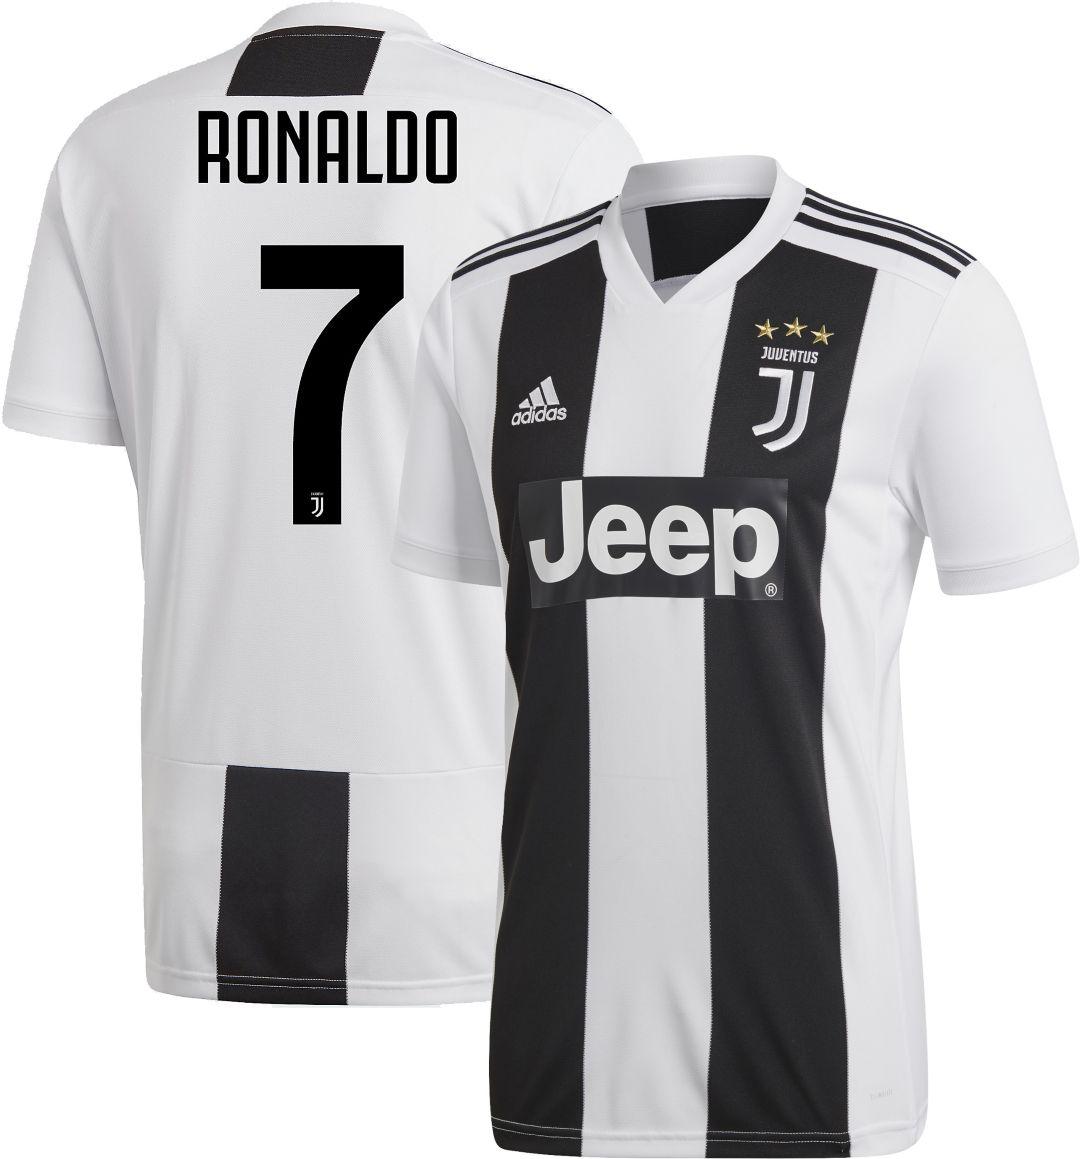 newest 47164 db7da adidas Men's Juventus Cristiano Ronaldo #7 Stadium Home Replica Jersey